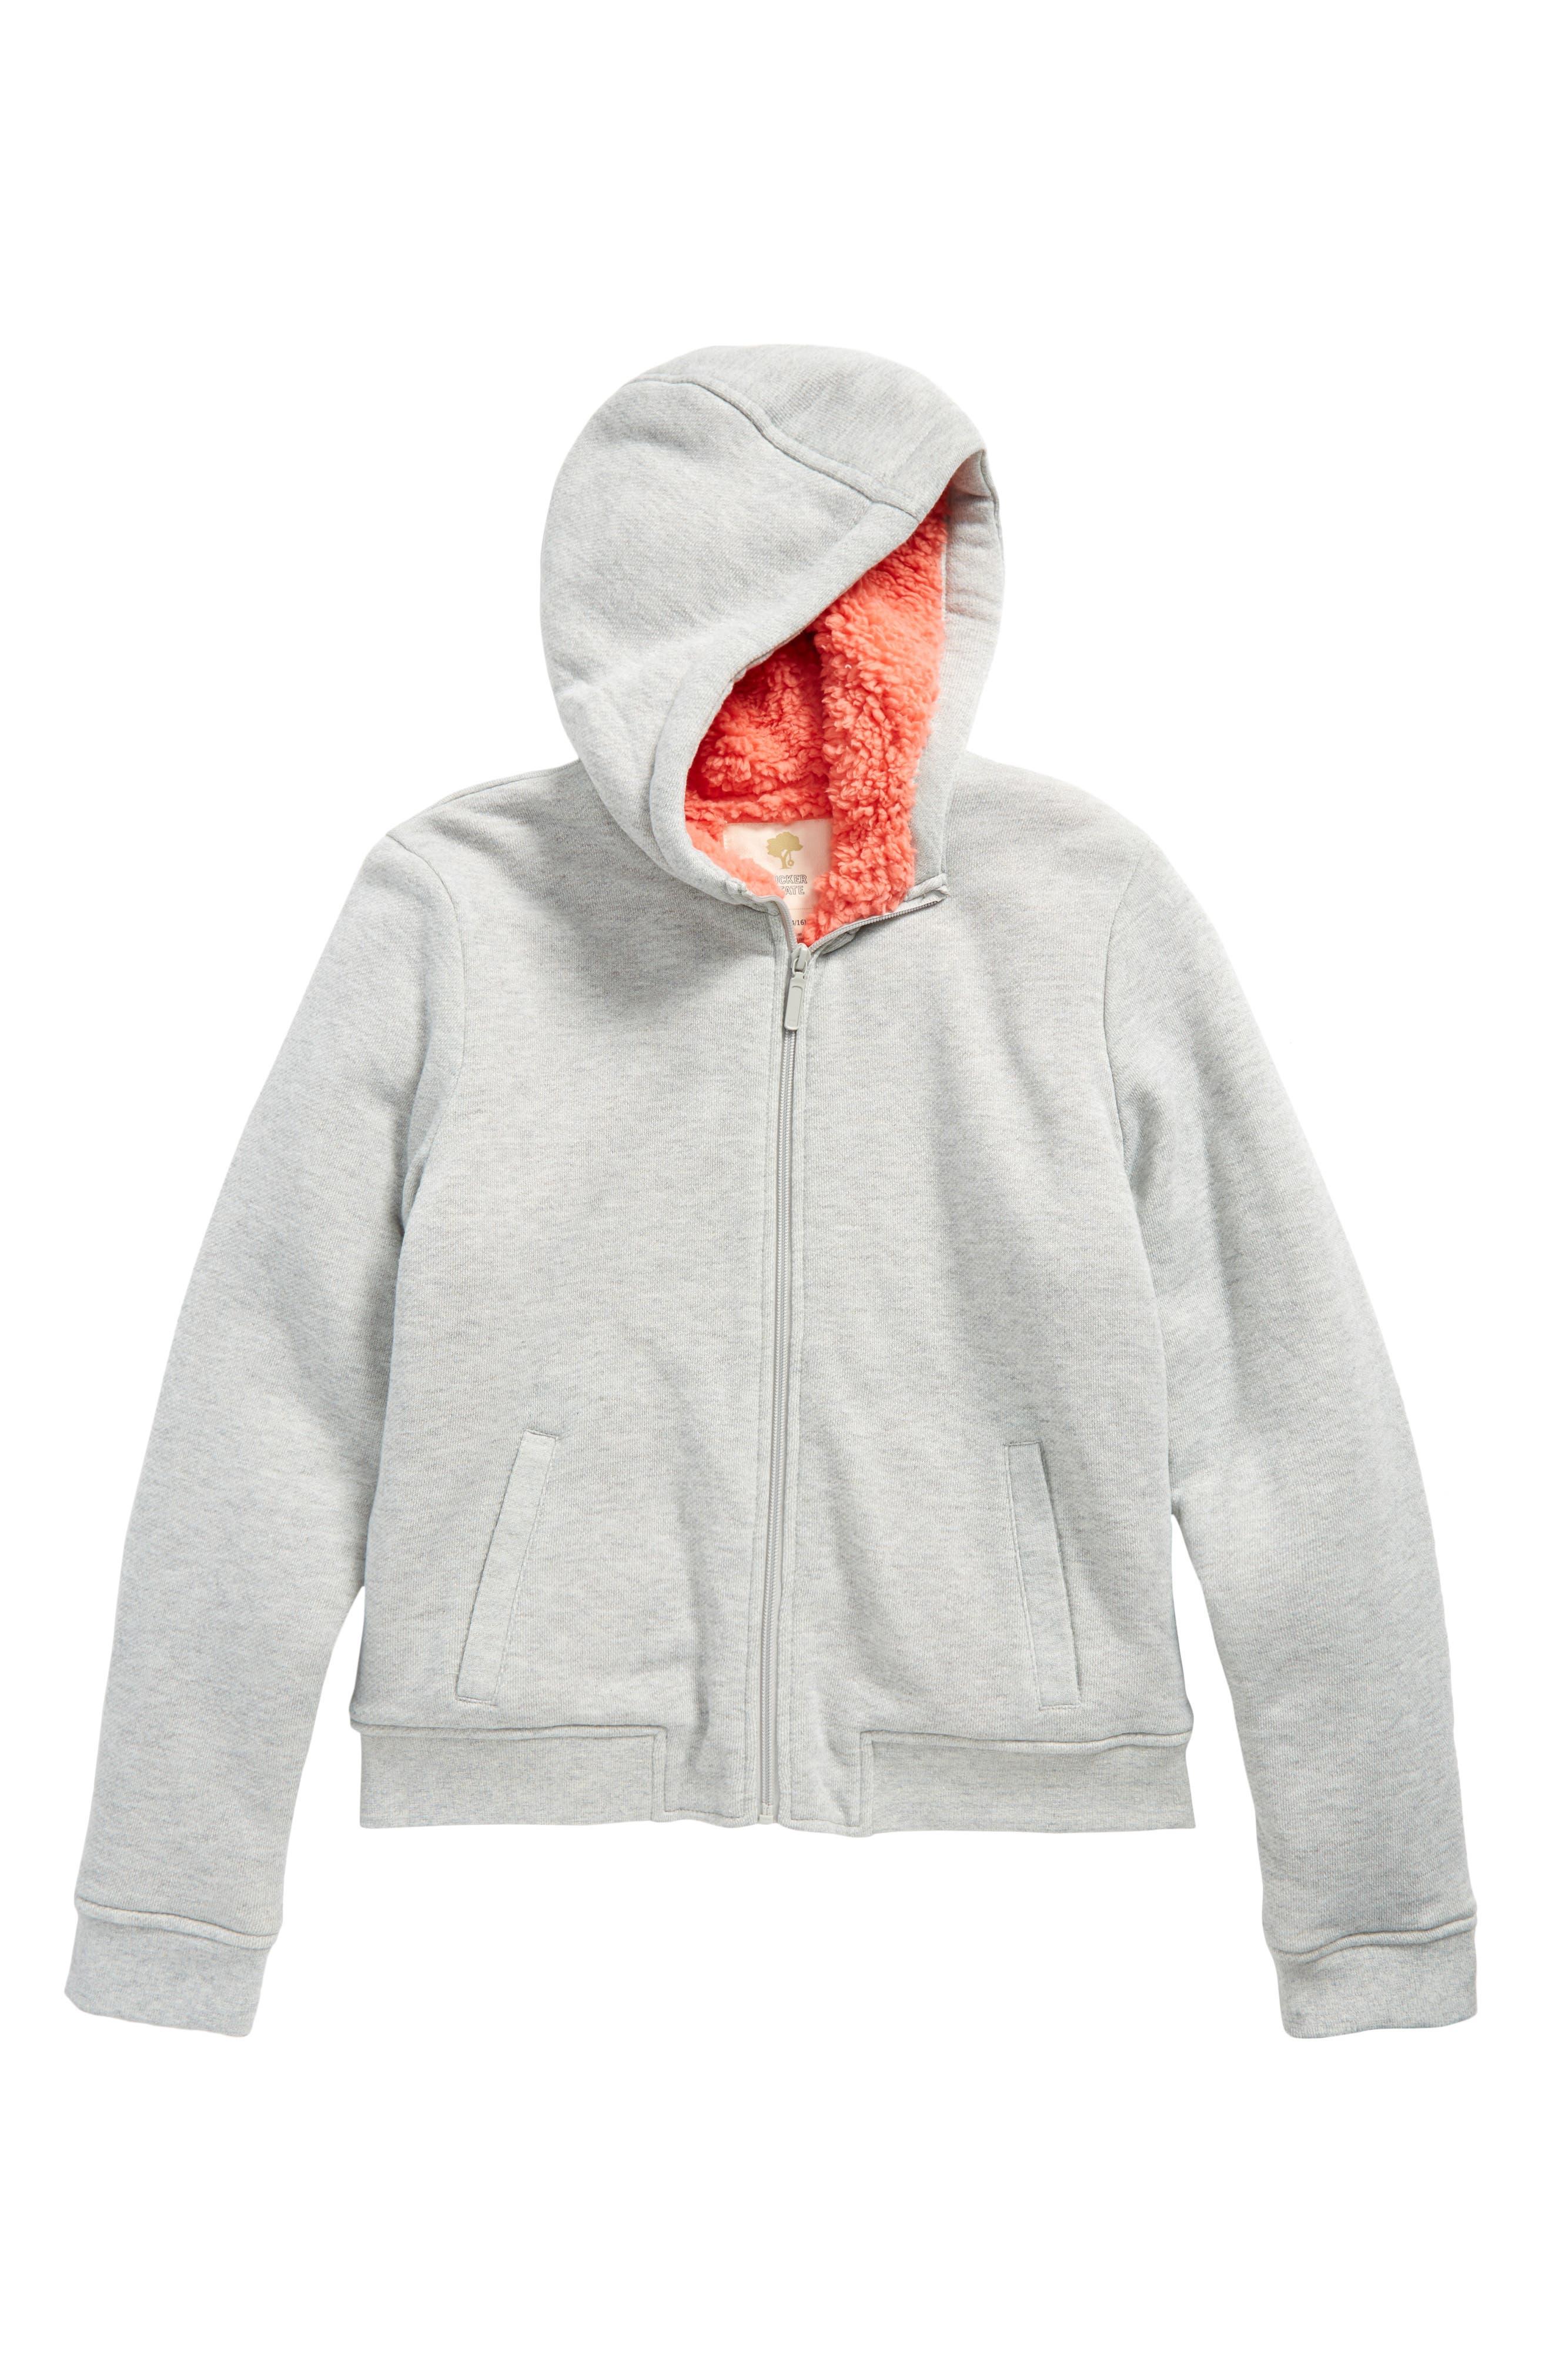 Fleece Lined Hoodie,                         Main,                         color, Grey Heather